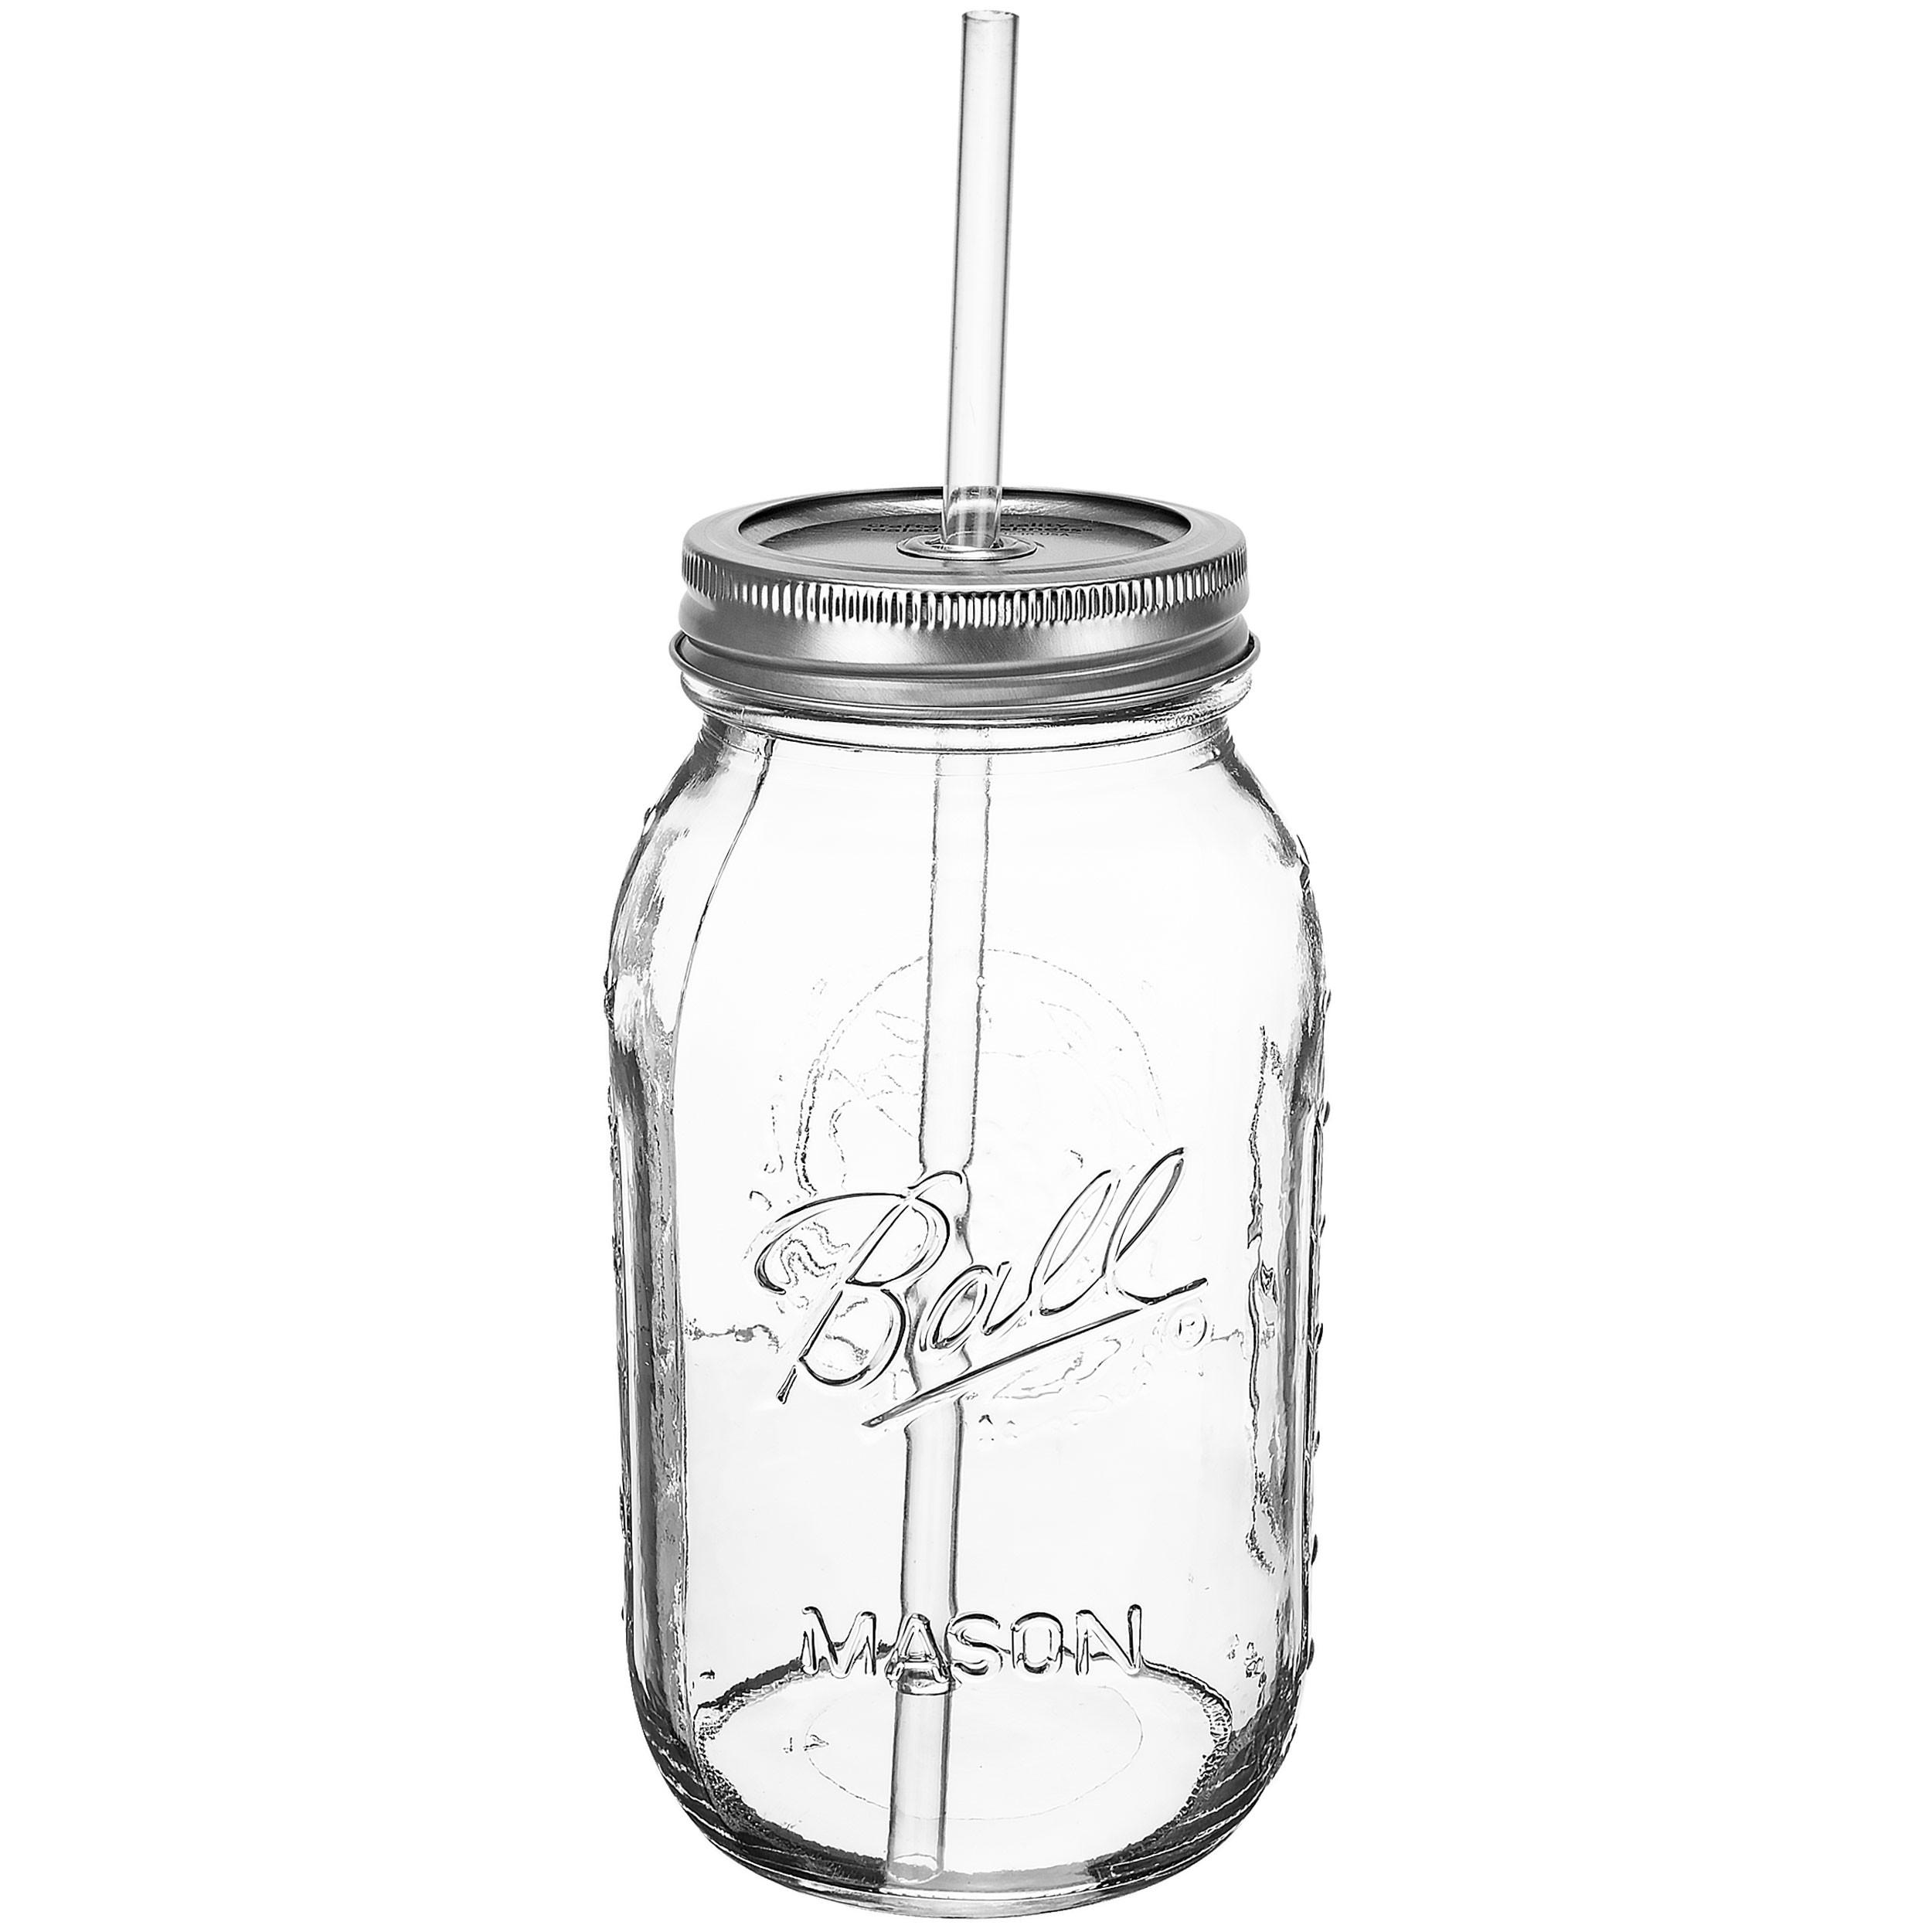 Redneck Guzzler Drinking Sipping Jar 32oz Mason Jar w/ Acrylic Reusable Straw